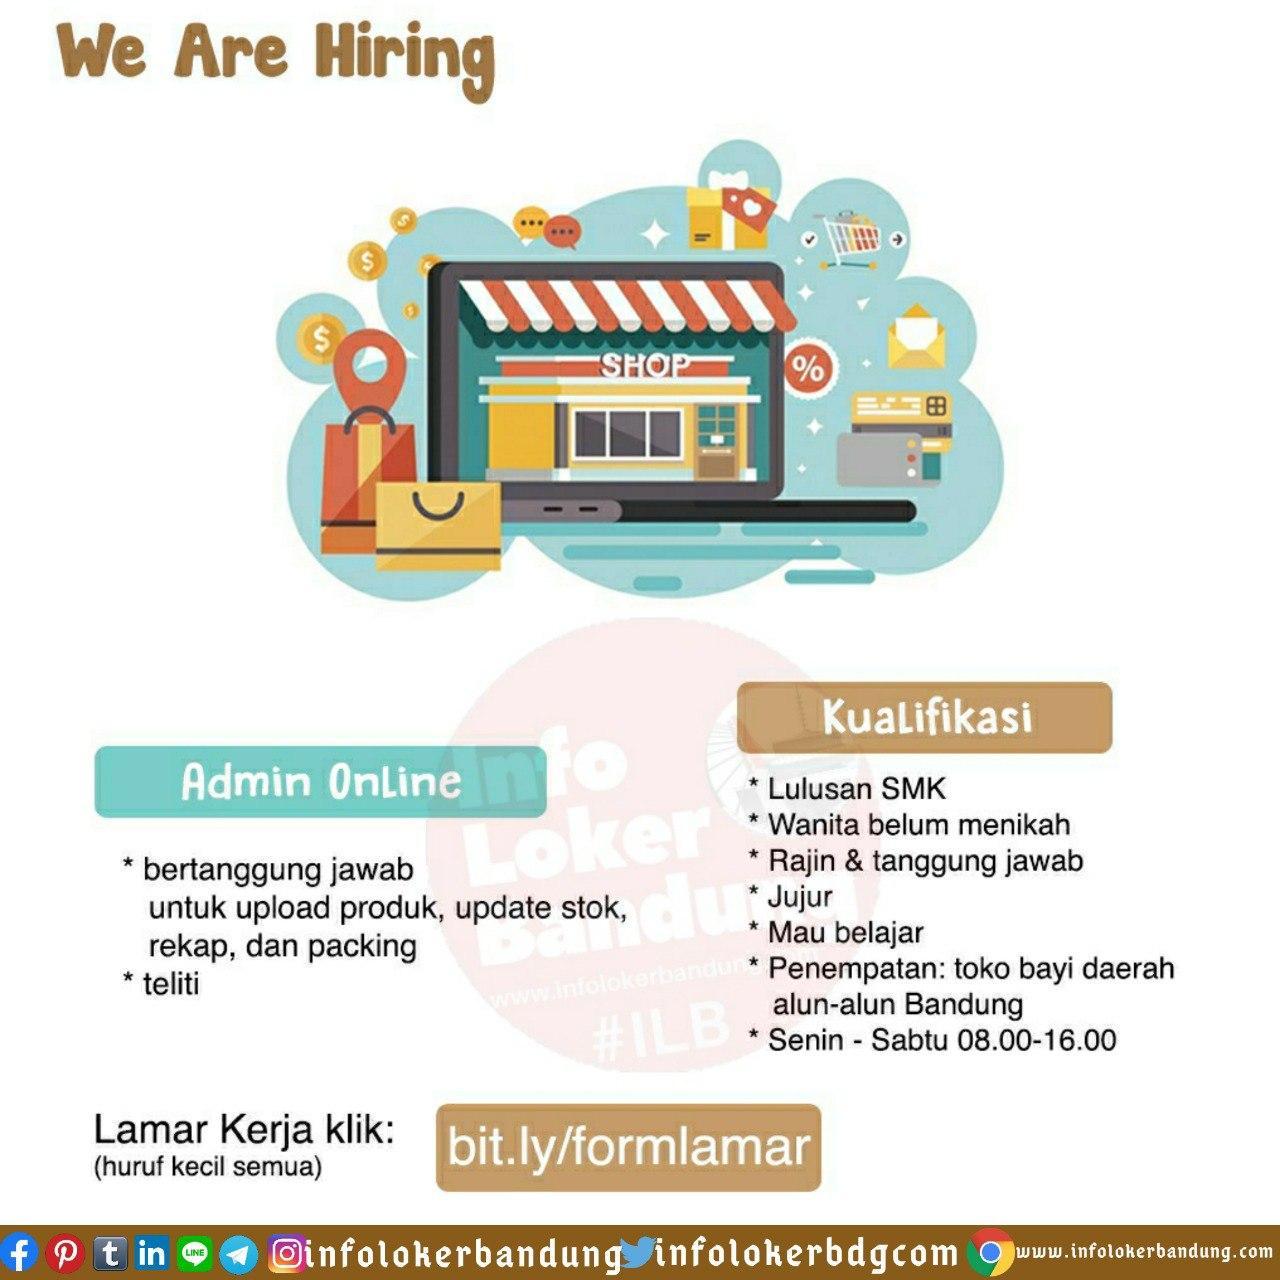 Lowongan Kerja Admin Online Toko Bayi Bandung Juni 2020 Info Loker Bandung 2021